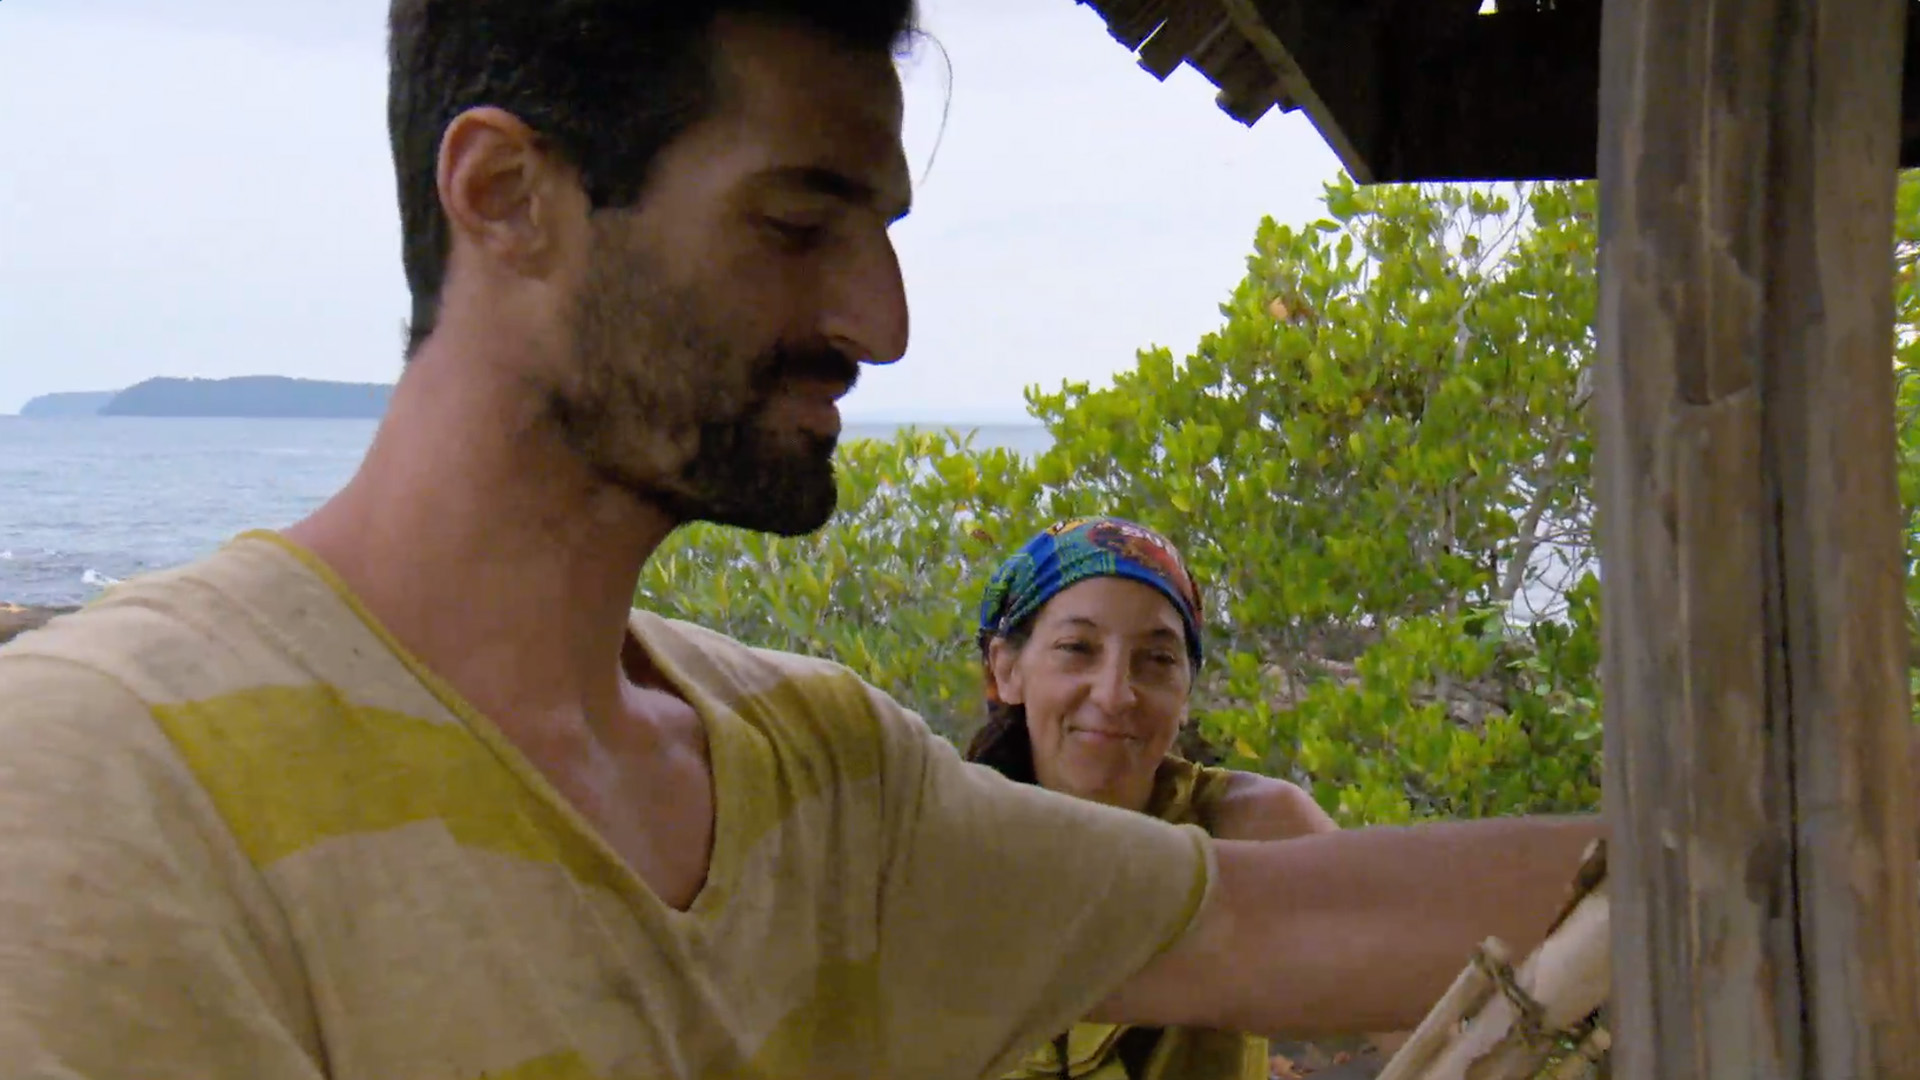 2. Debbie crushes on Nick.